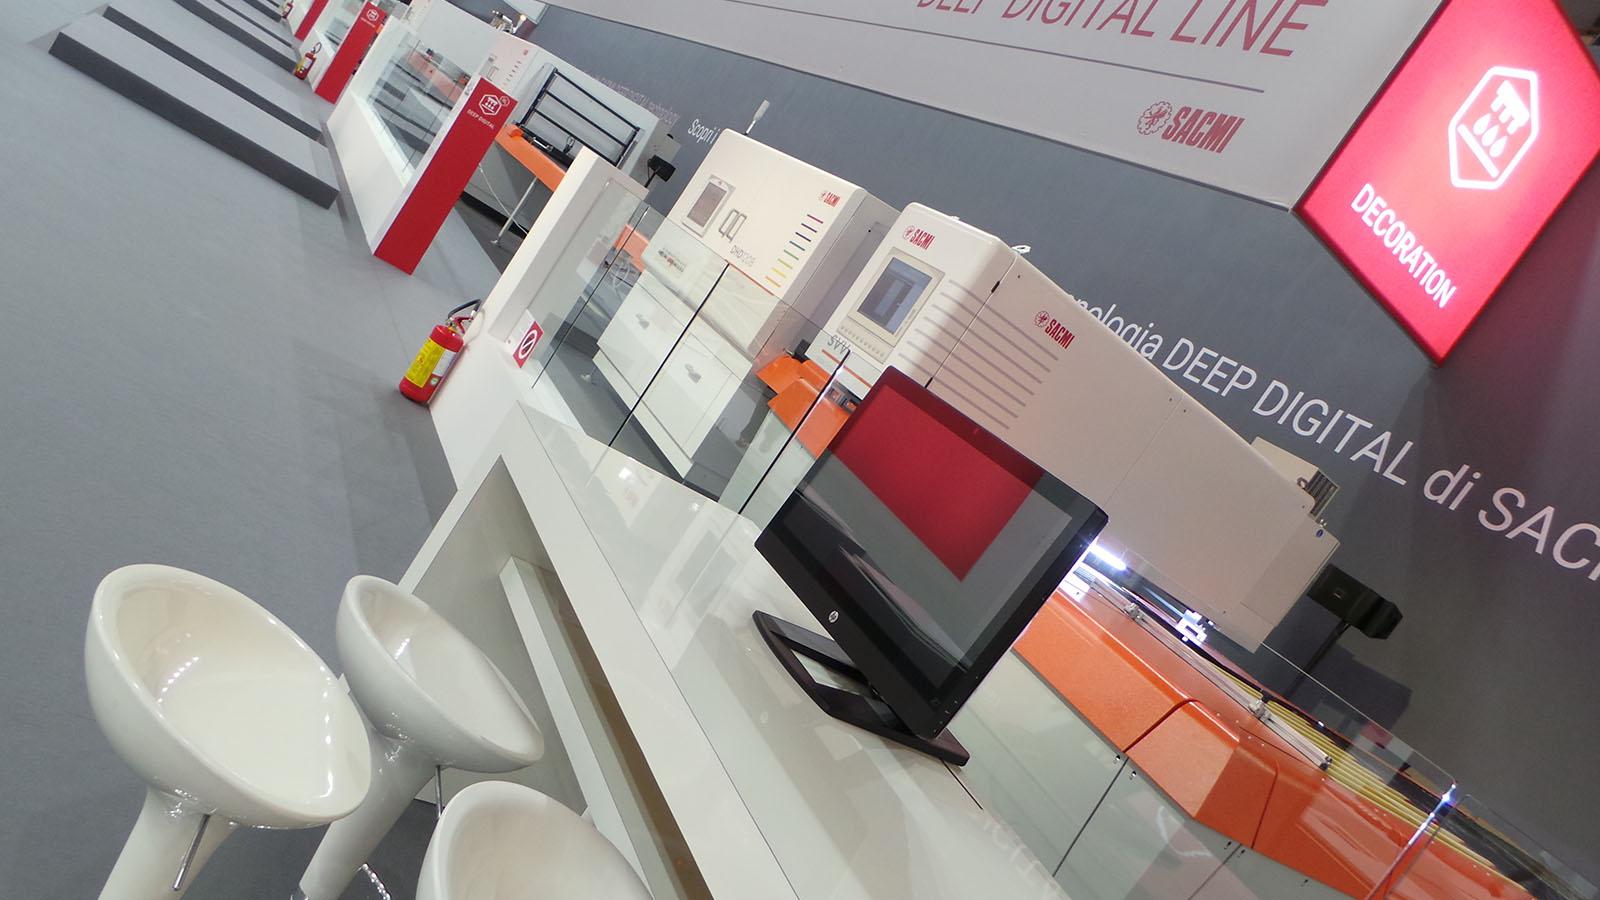 sacmi-macchine-digitali-2018-linea macchine